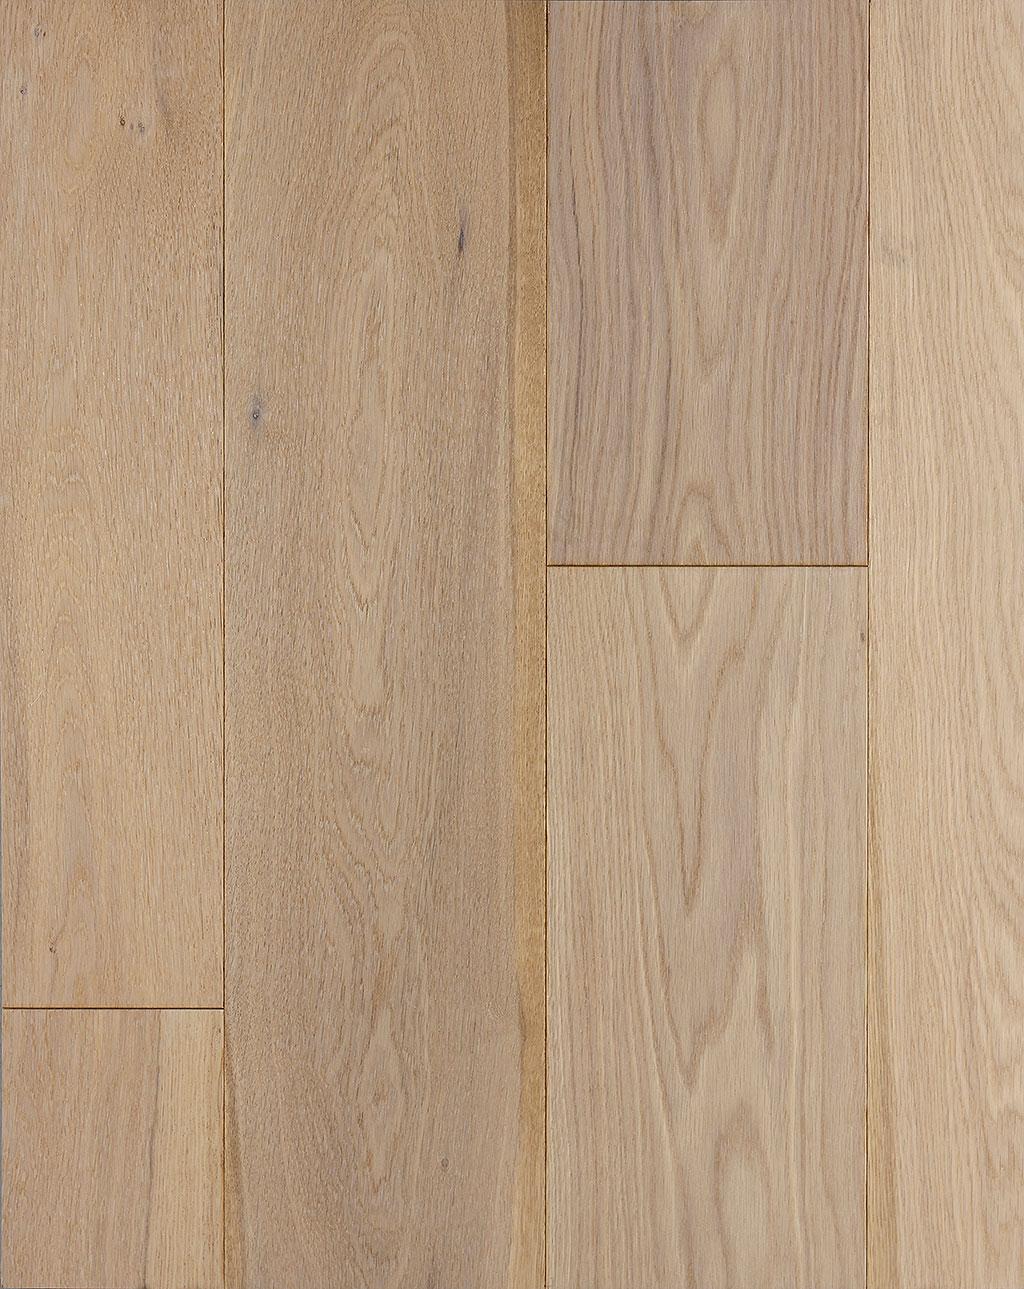 Medallion Hardwood Flooring Buckhead Strip - Medallion flooring distributor